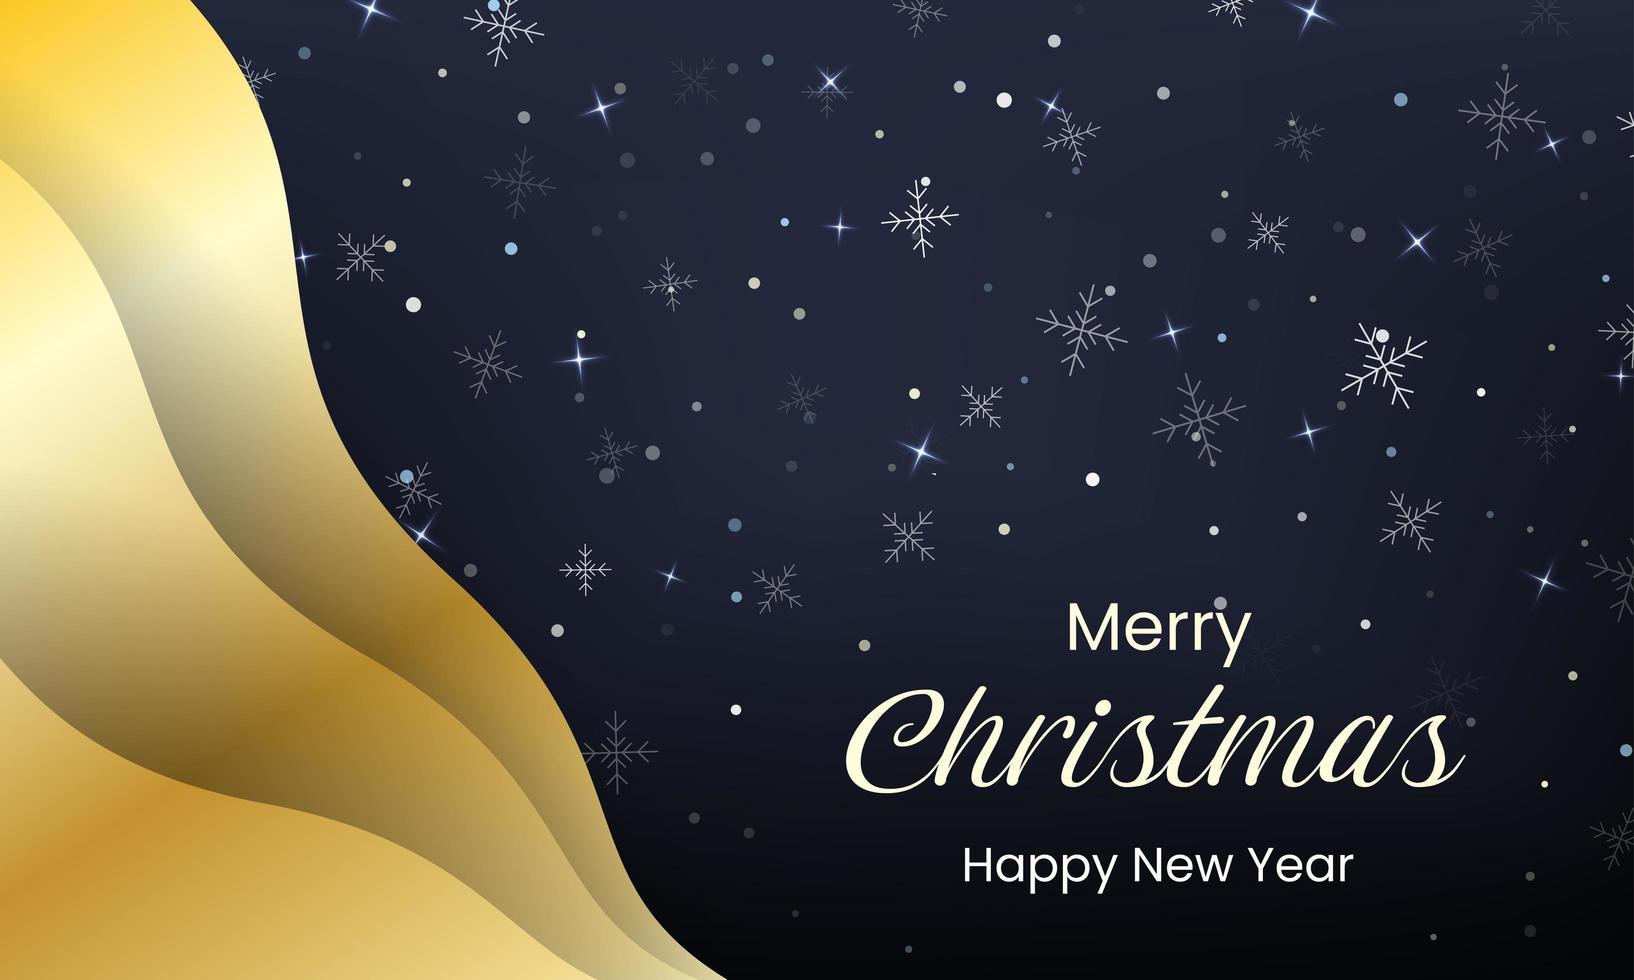 Christmas greeting design vector